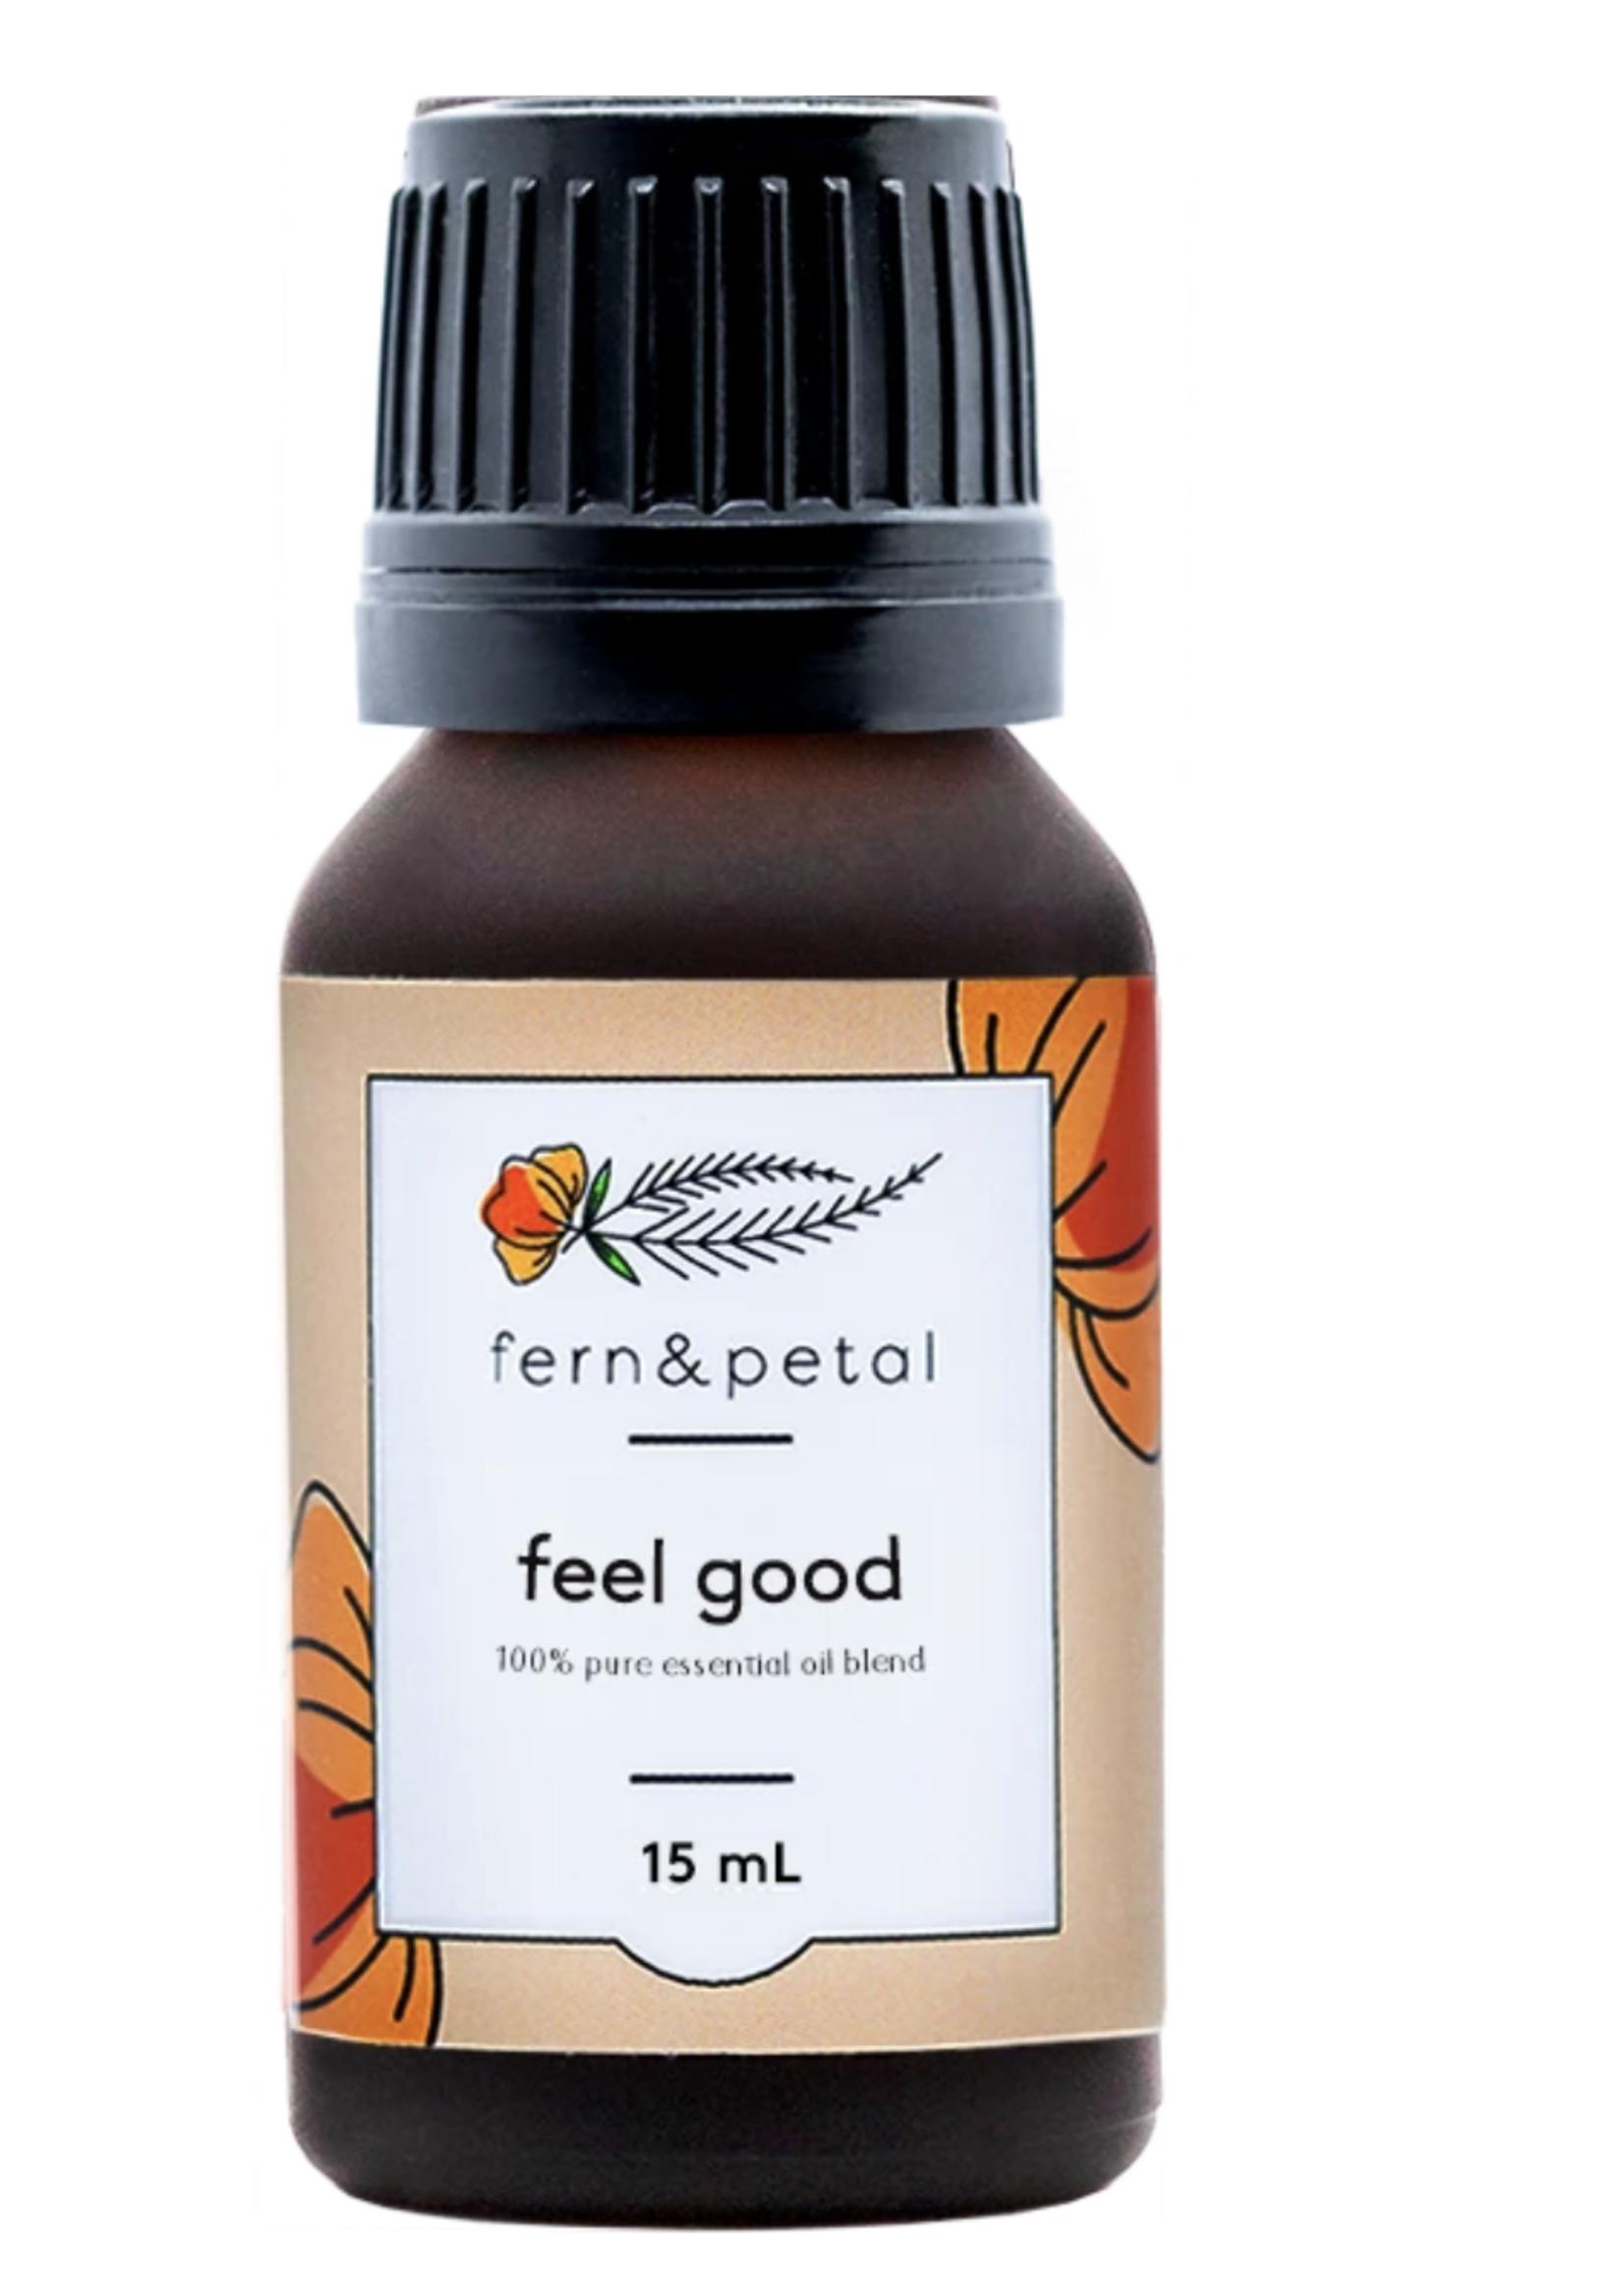 Feel Good Essential Oil Blend